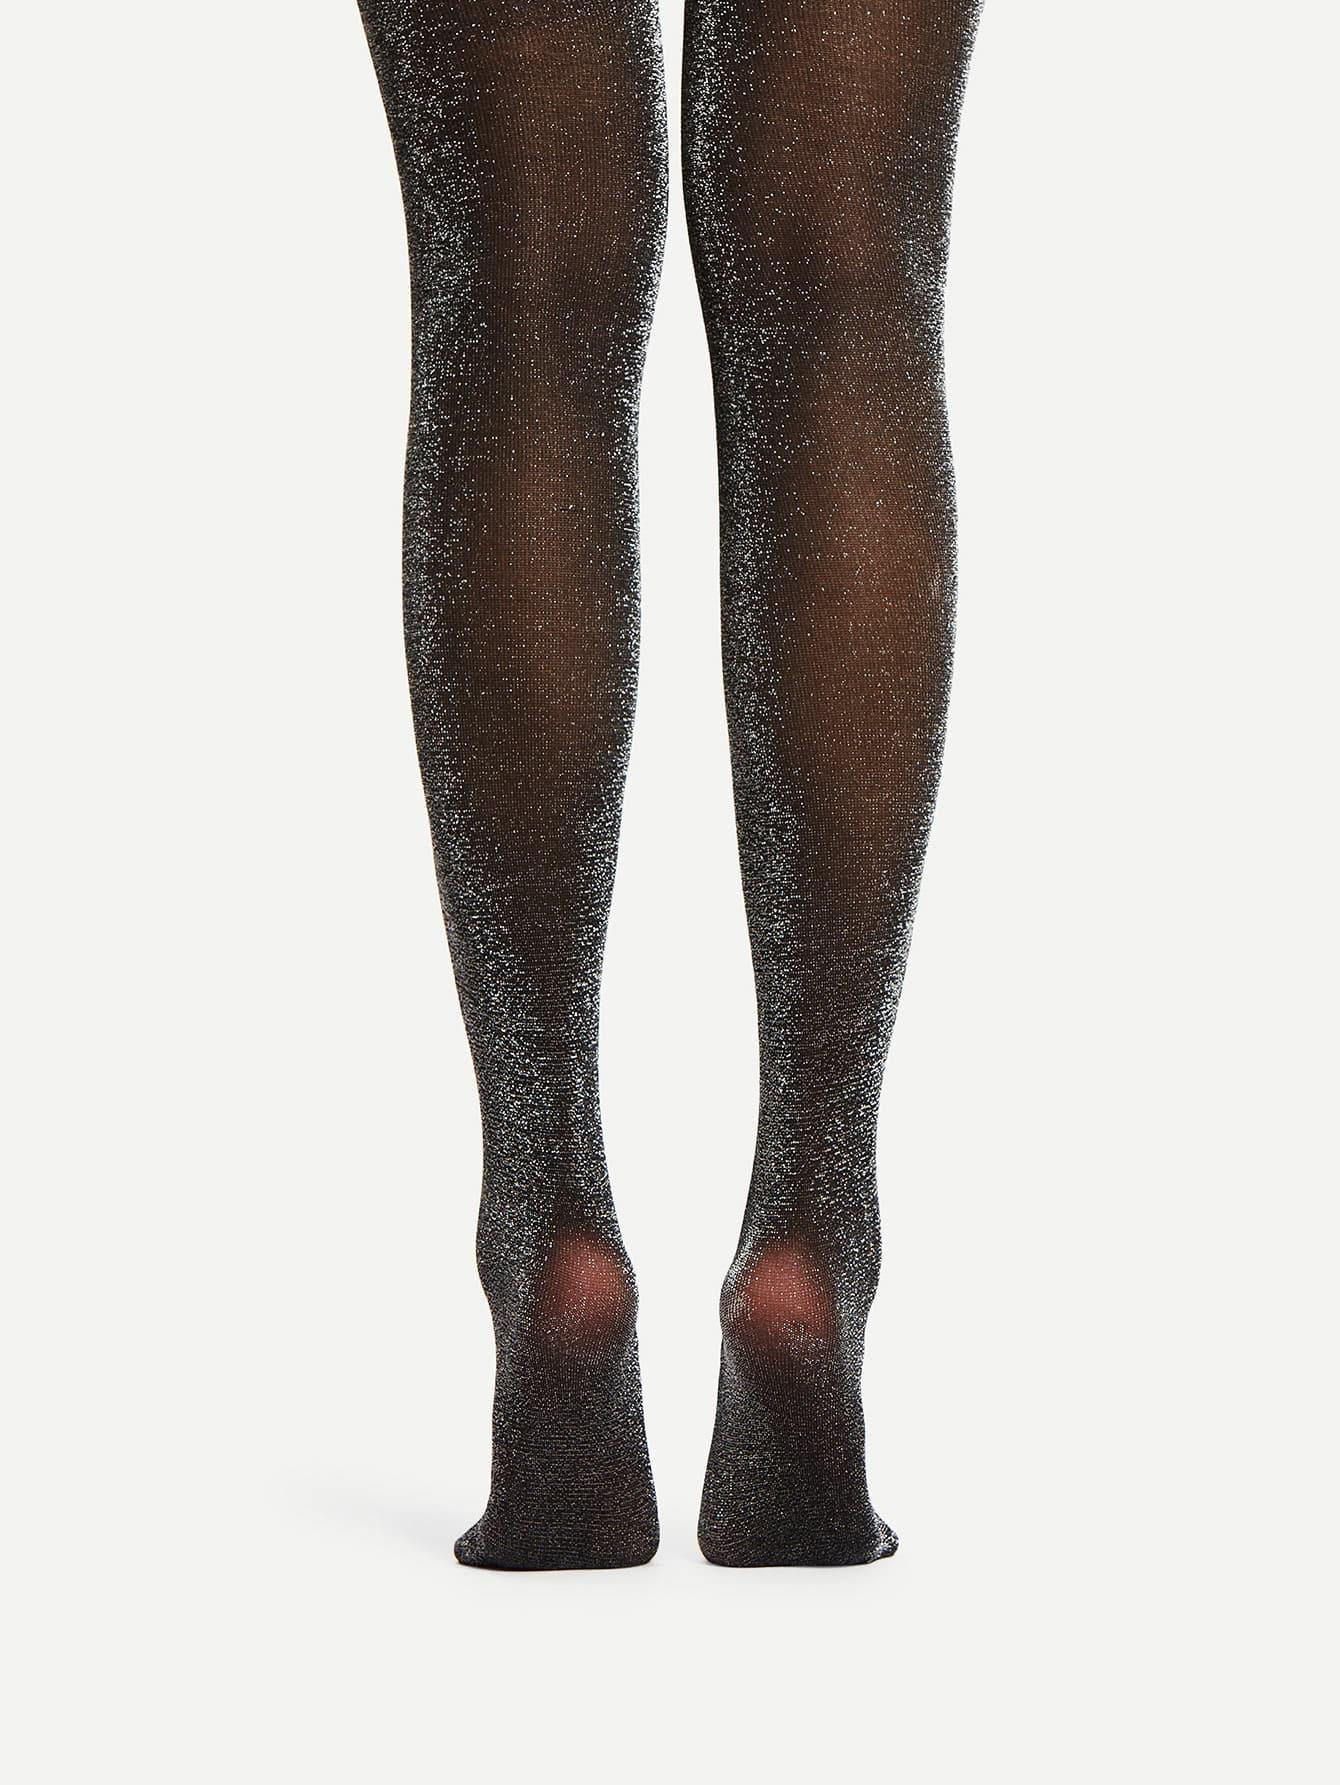 Glitter Pantyhose Stockings mesh design pantyhose stockings